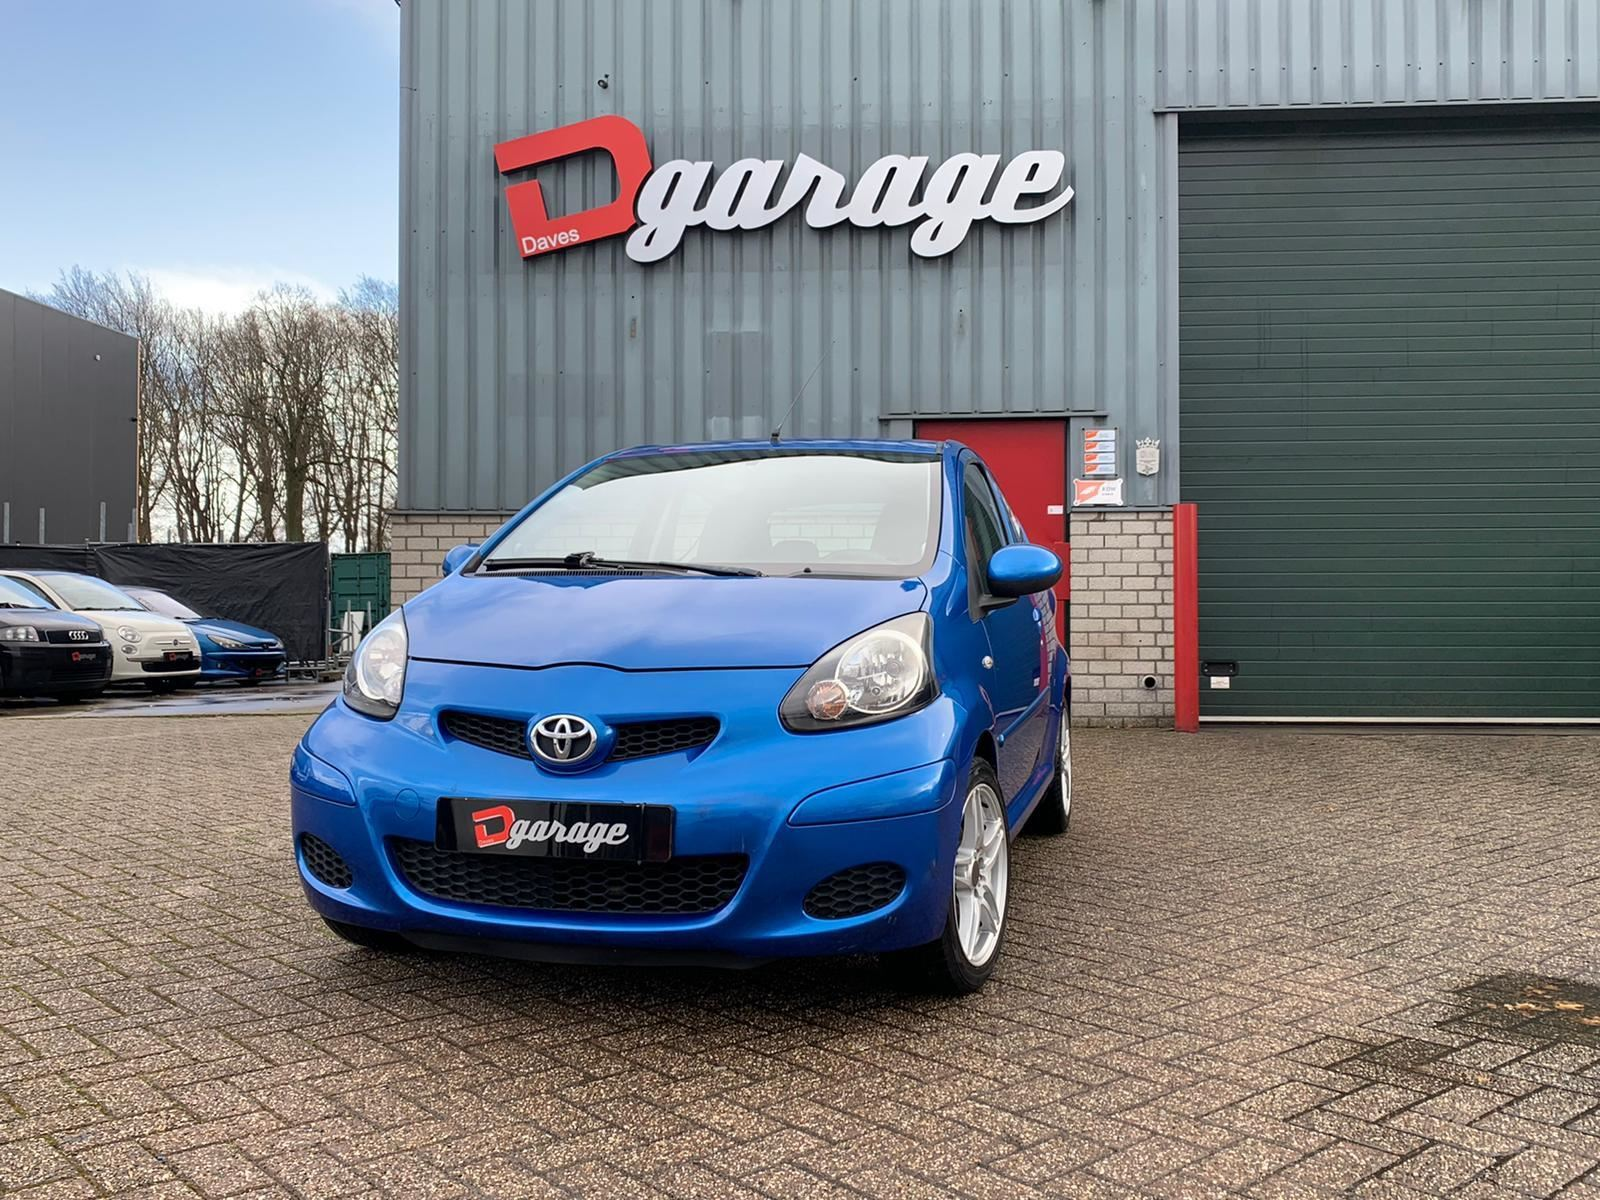 Toyota Aygo occasion - Dave's Garage